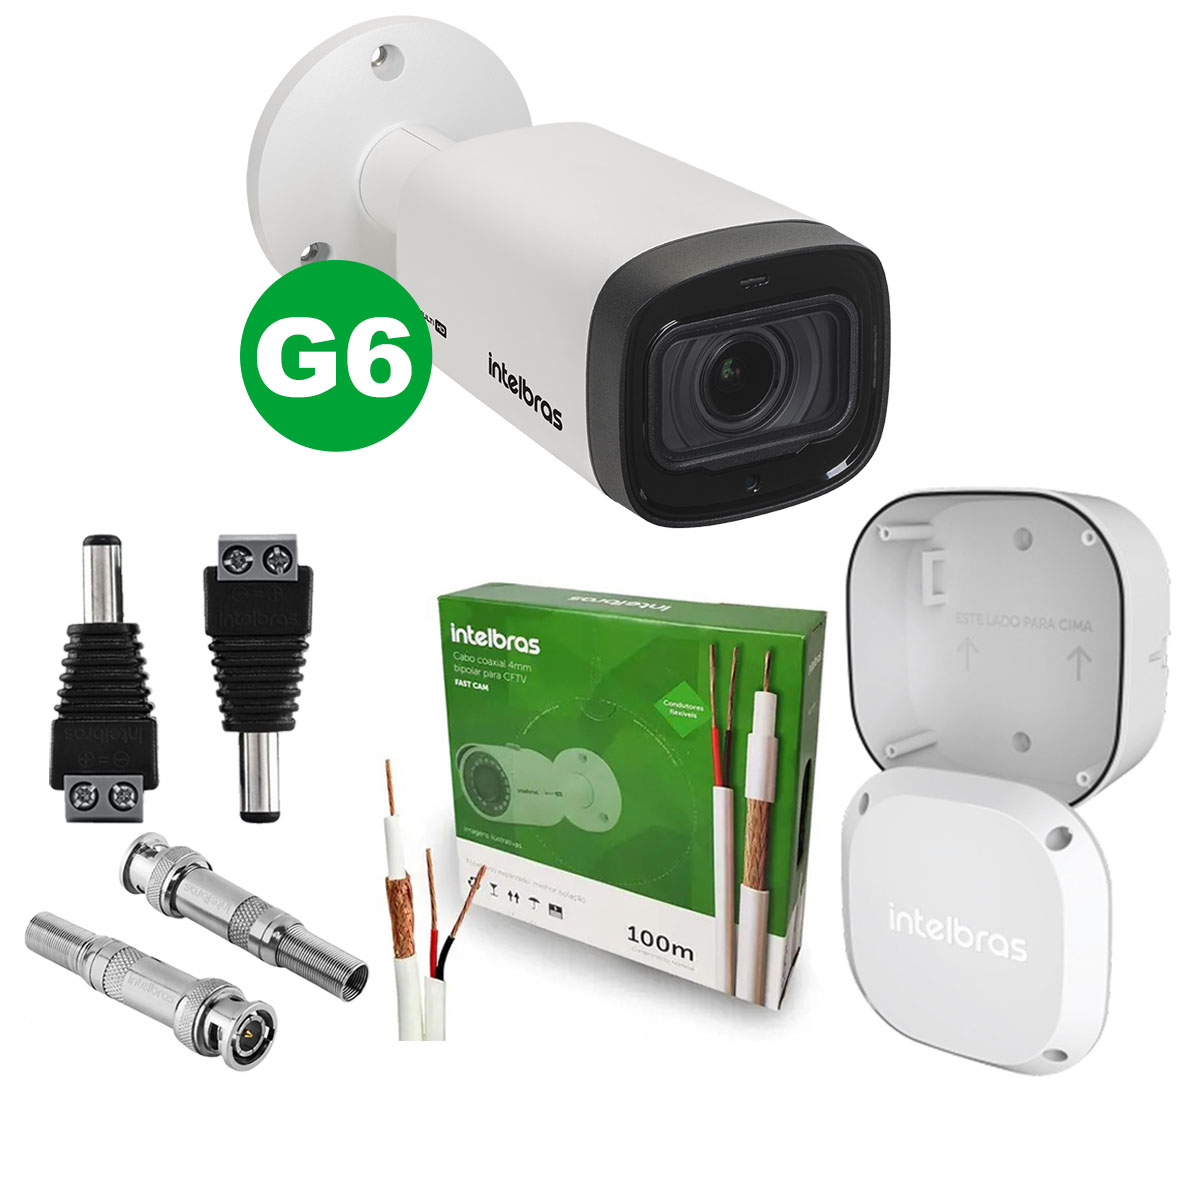 Kit Câmera Bullet Intelbras Vhd 3240 Vf G6 2.7 a 12mm + Cabo + Acessórios